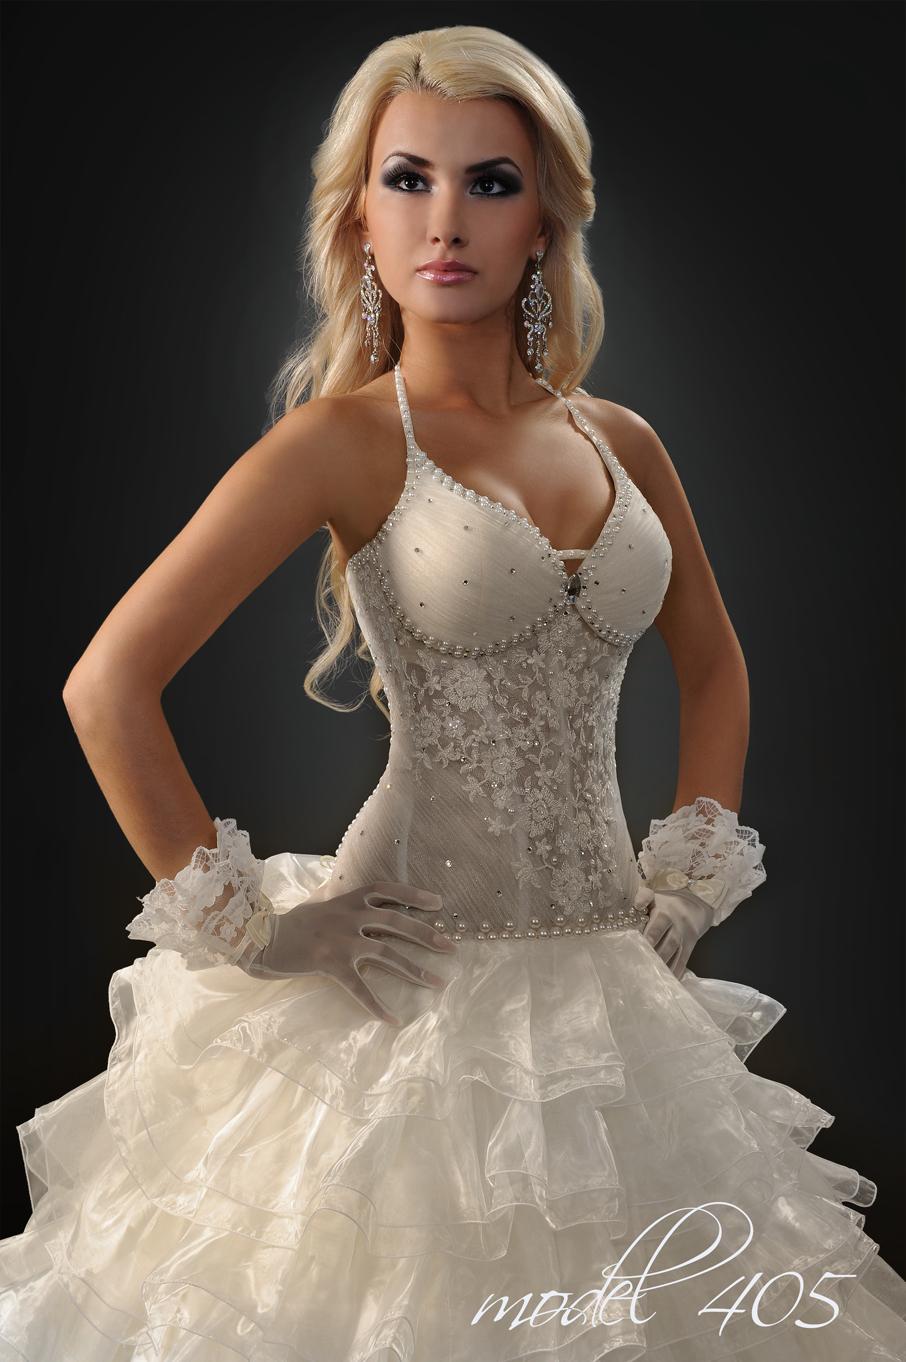 فروش اينترنتي لباس عروس